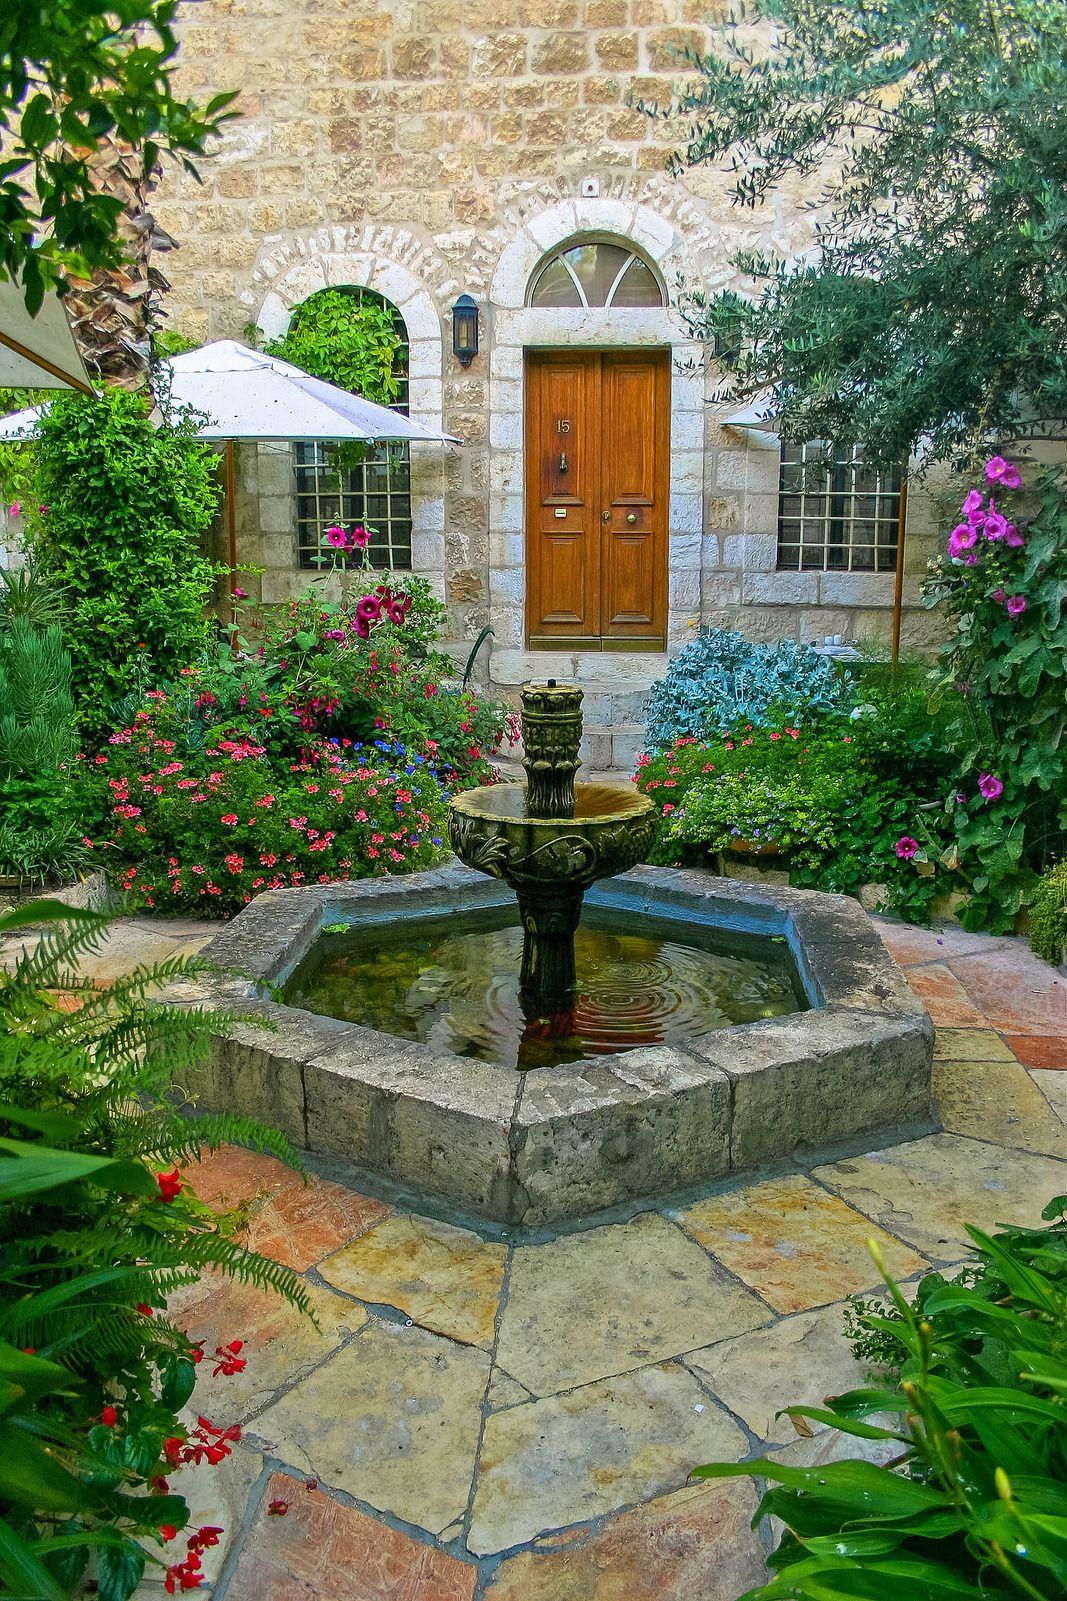 Jerusalem Courtyard Beautiful gardens, Fountains & ponds